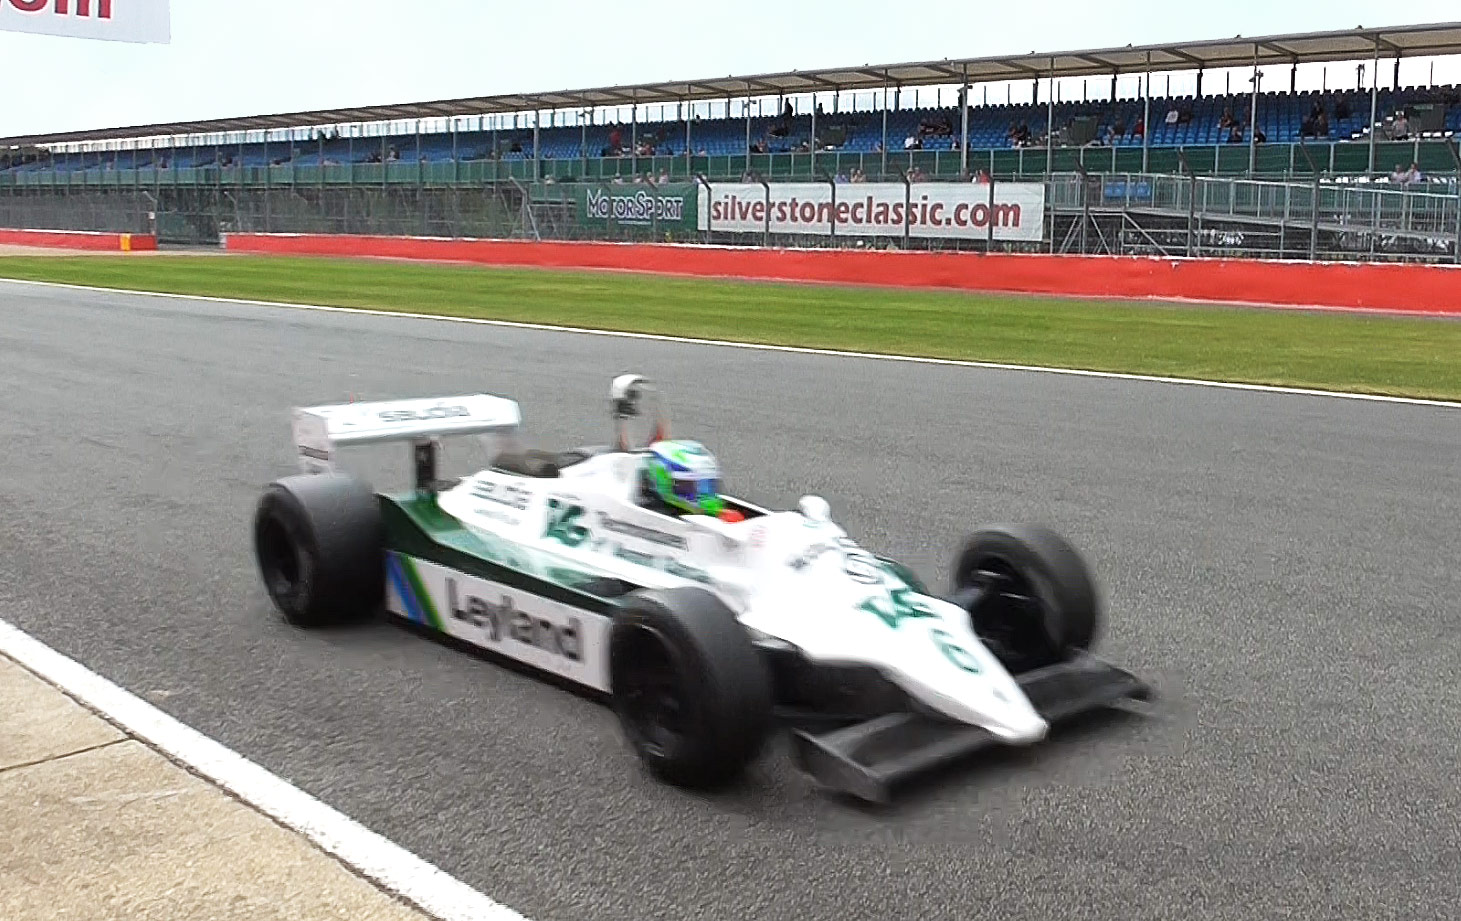 Silverstone-Classic-Historic-Racing